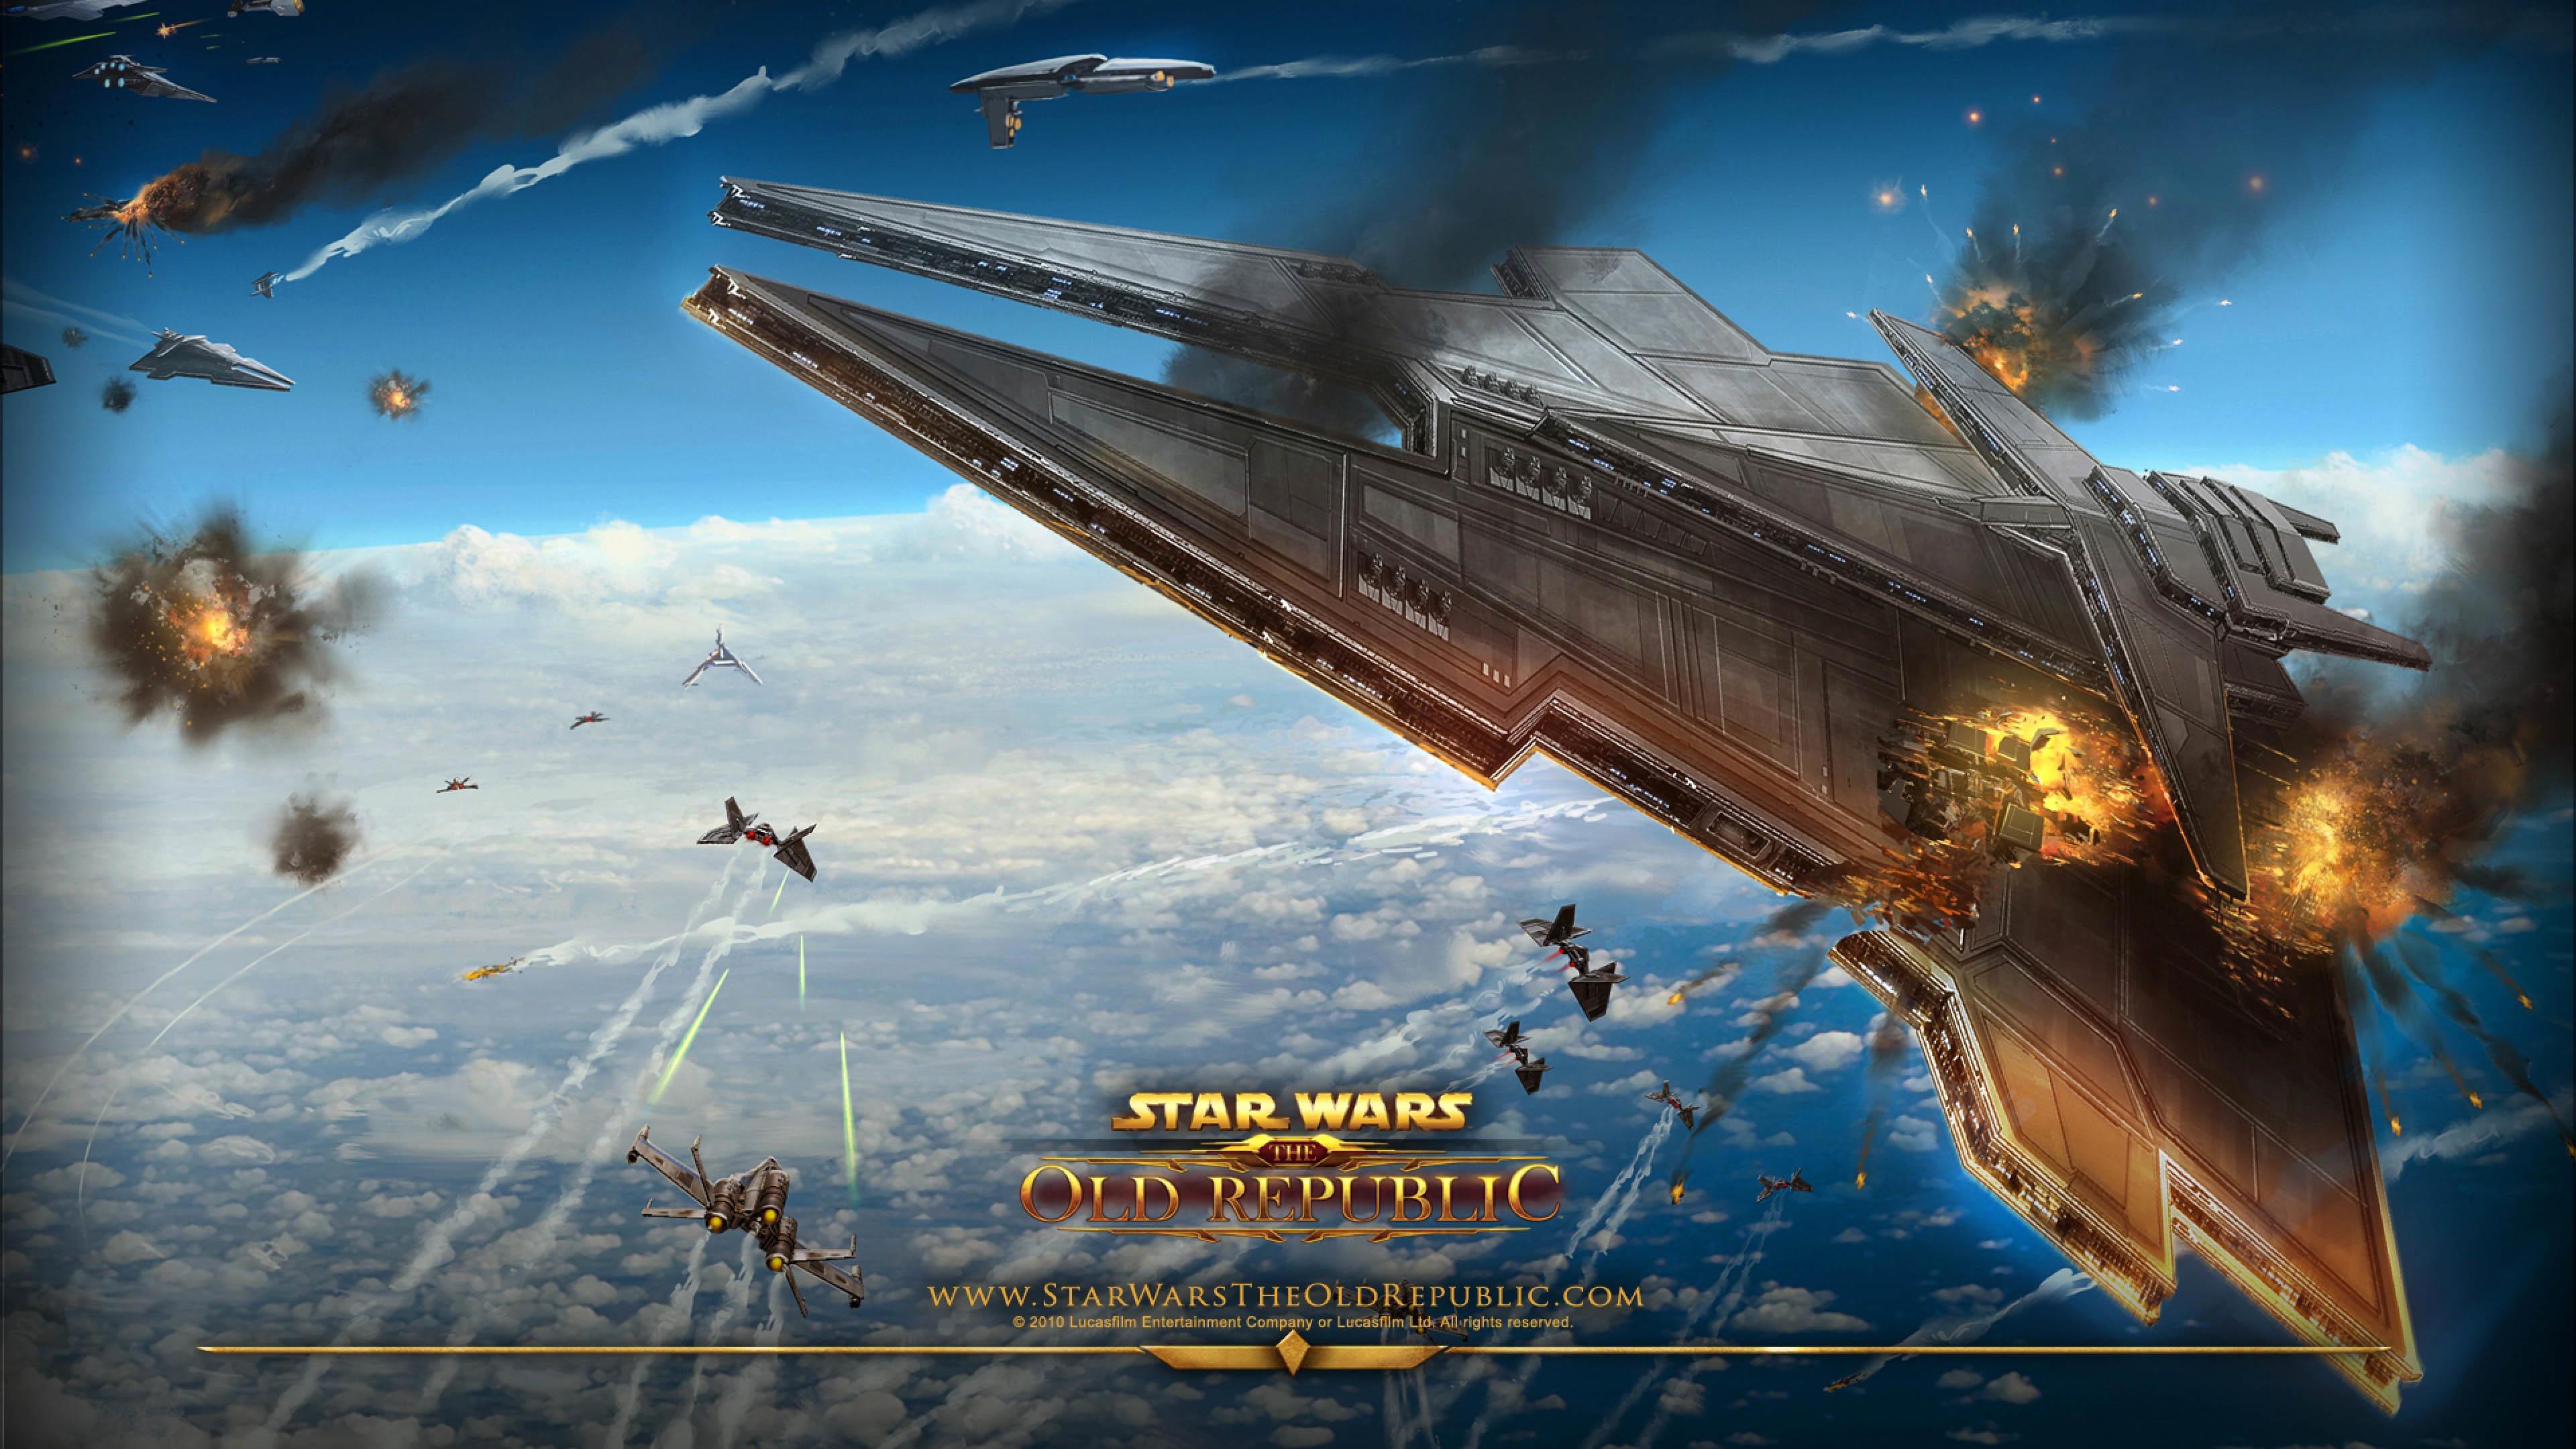 Star Wars: The Old Republic – Star Destroyer exploding wallpaper